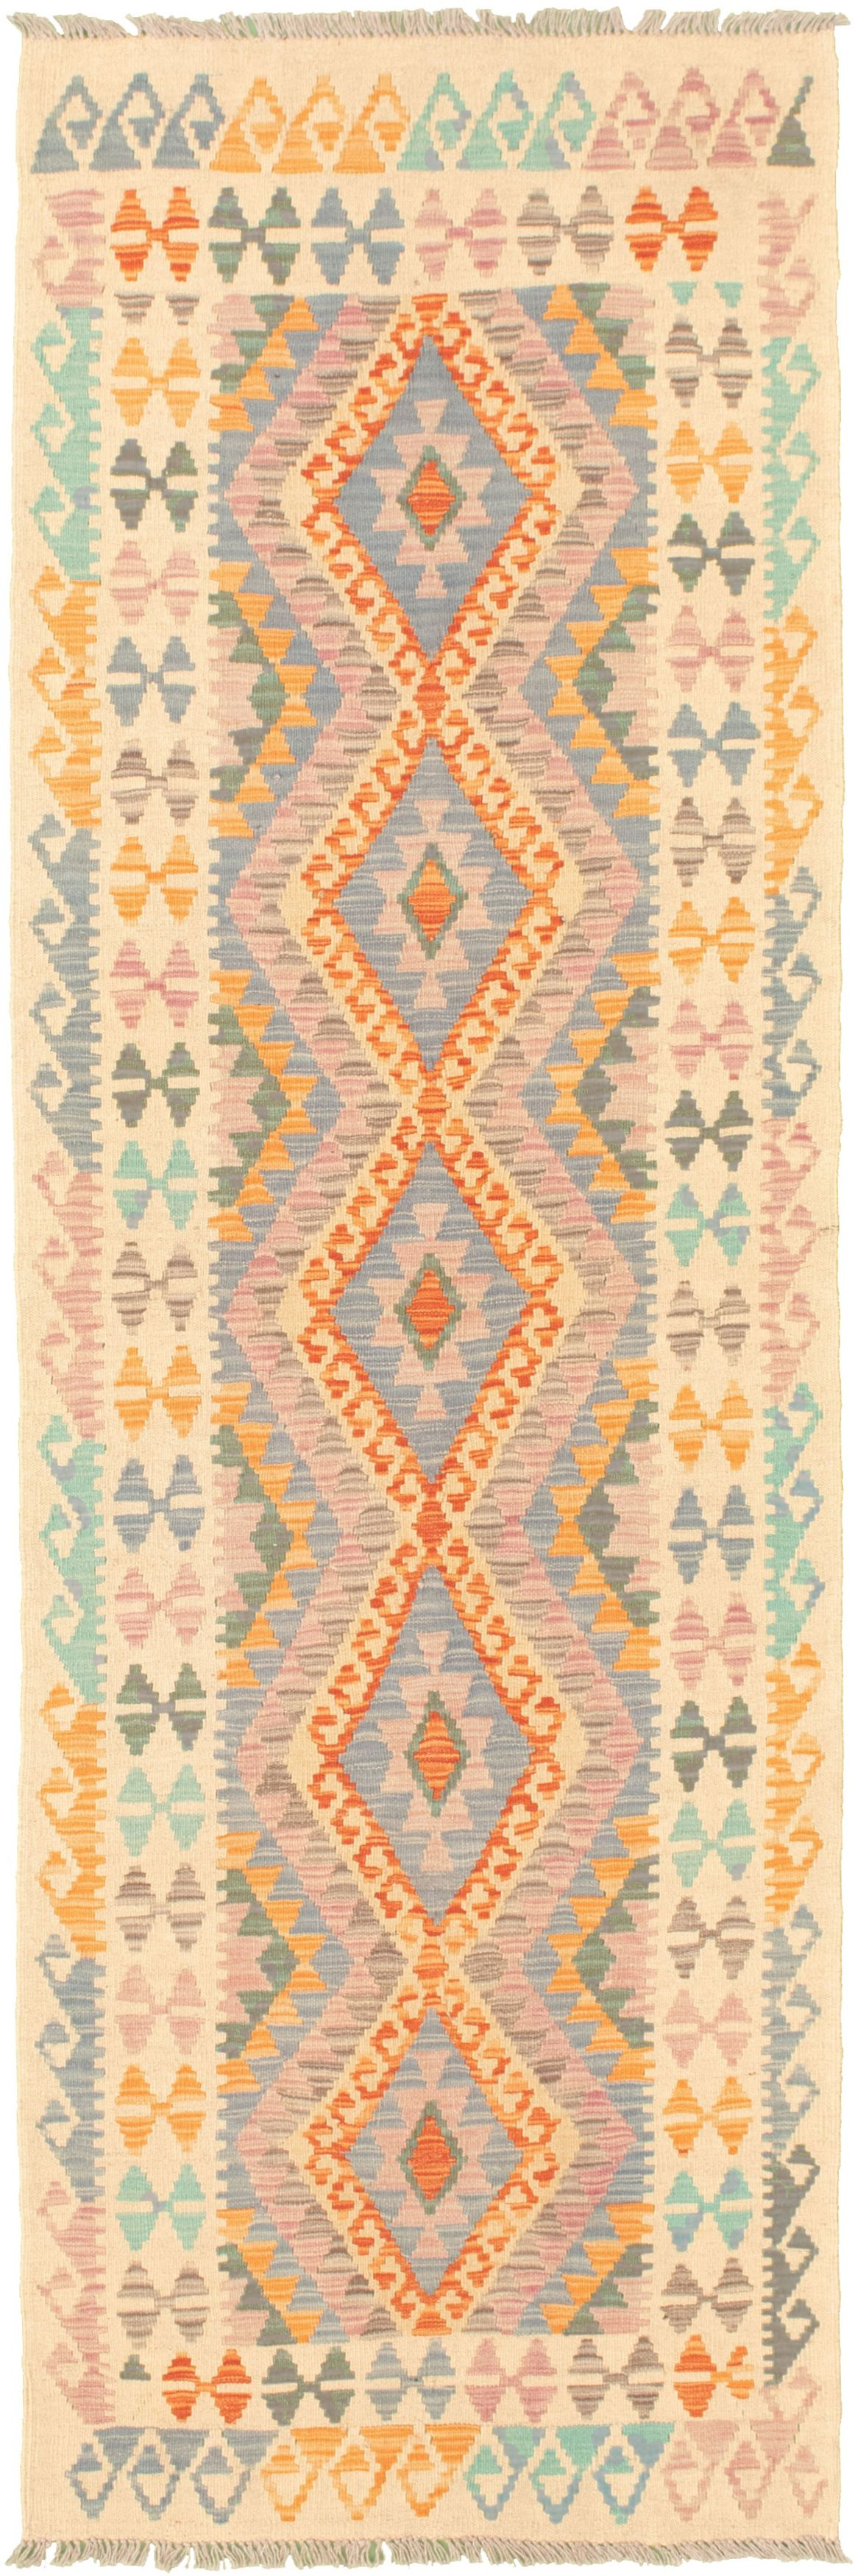 "Hand woven Bold and Colorful  Cream, Orange  Kilim 2'10"" x 9'3"" Size: 2'10"" x 9'3"""